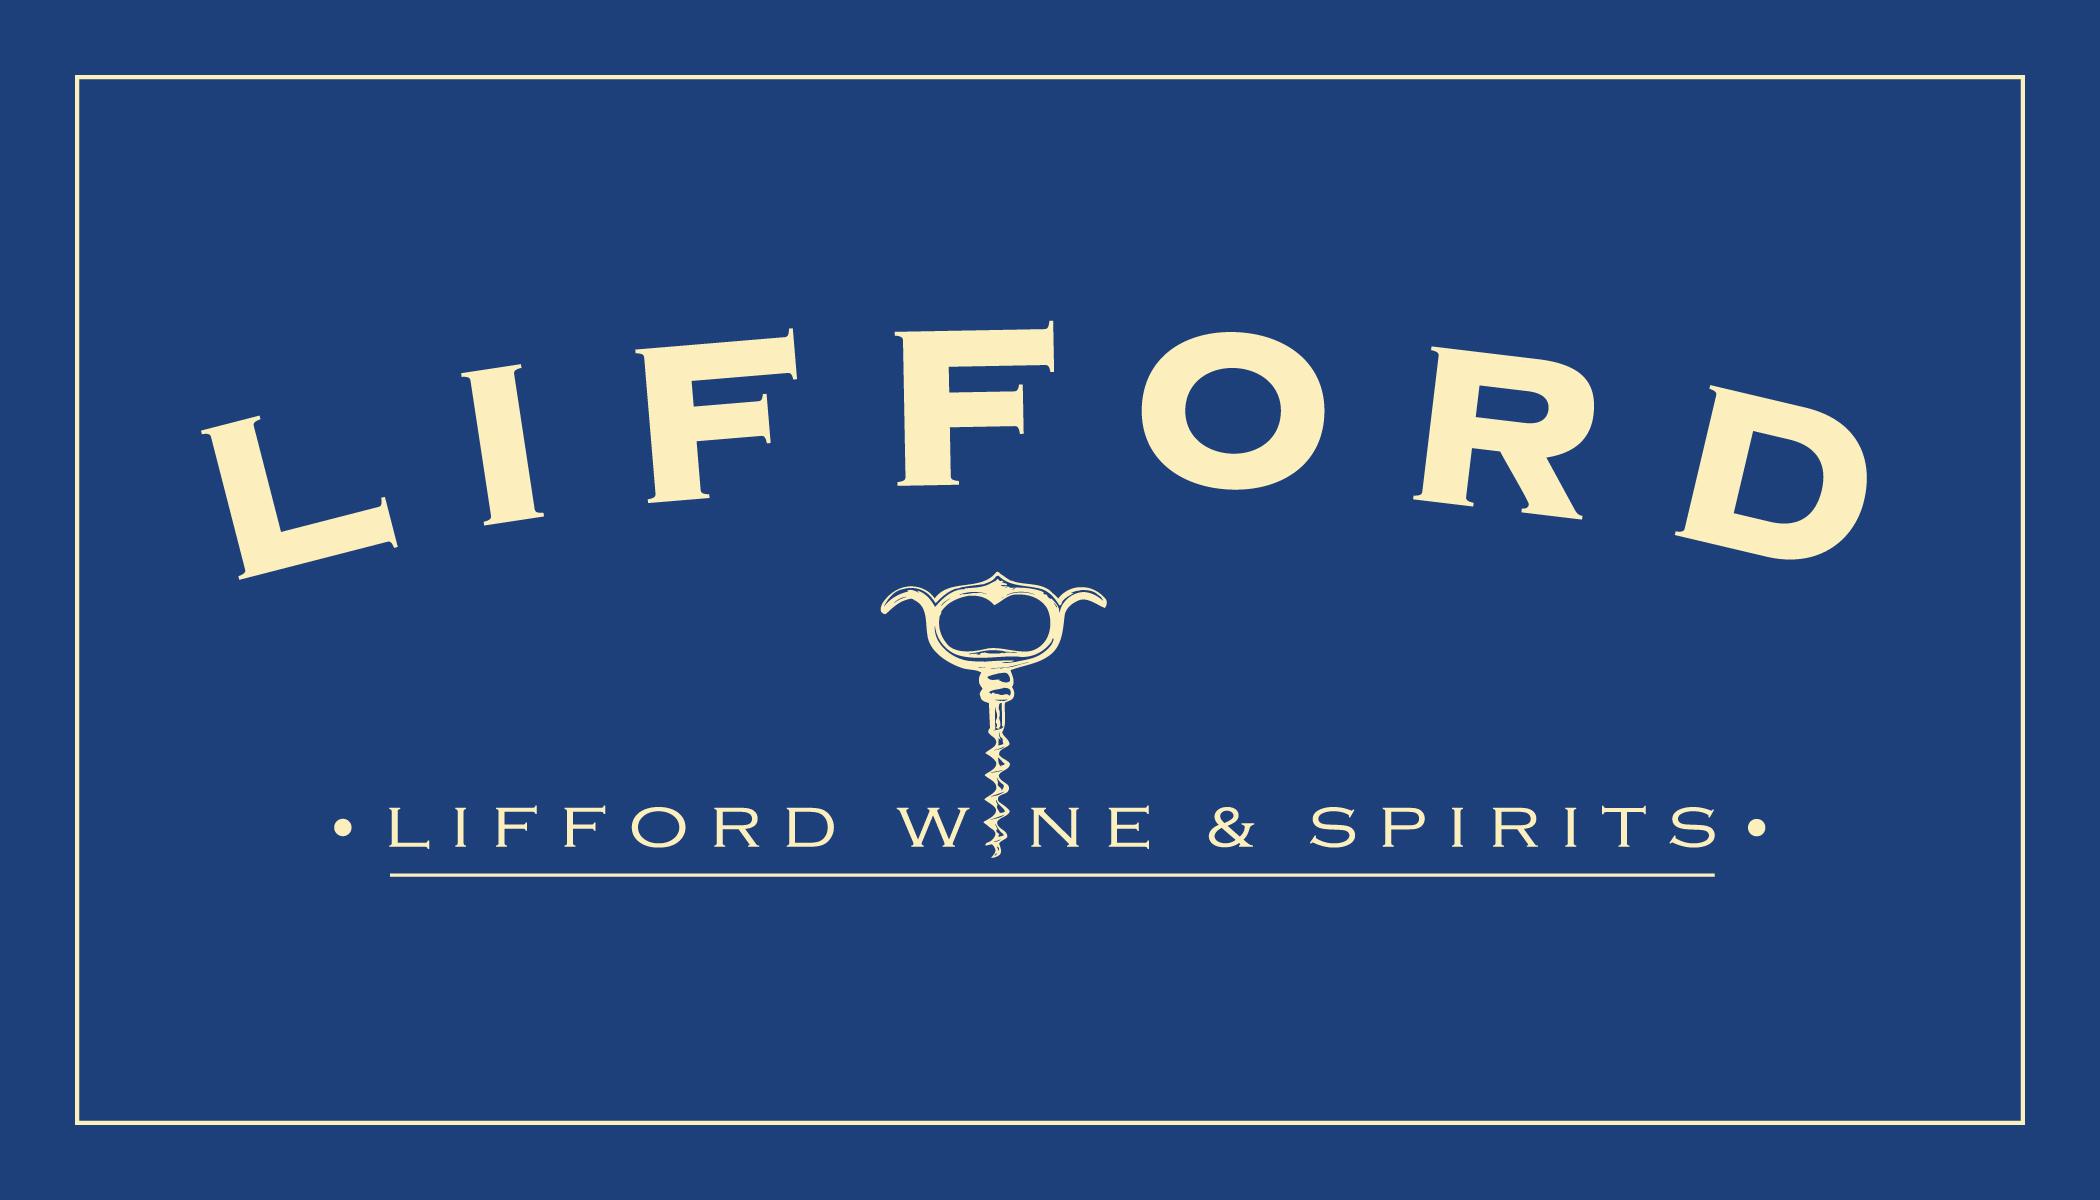 Lifford Wine & Spirits logo